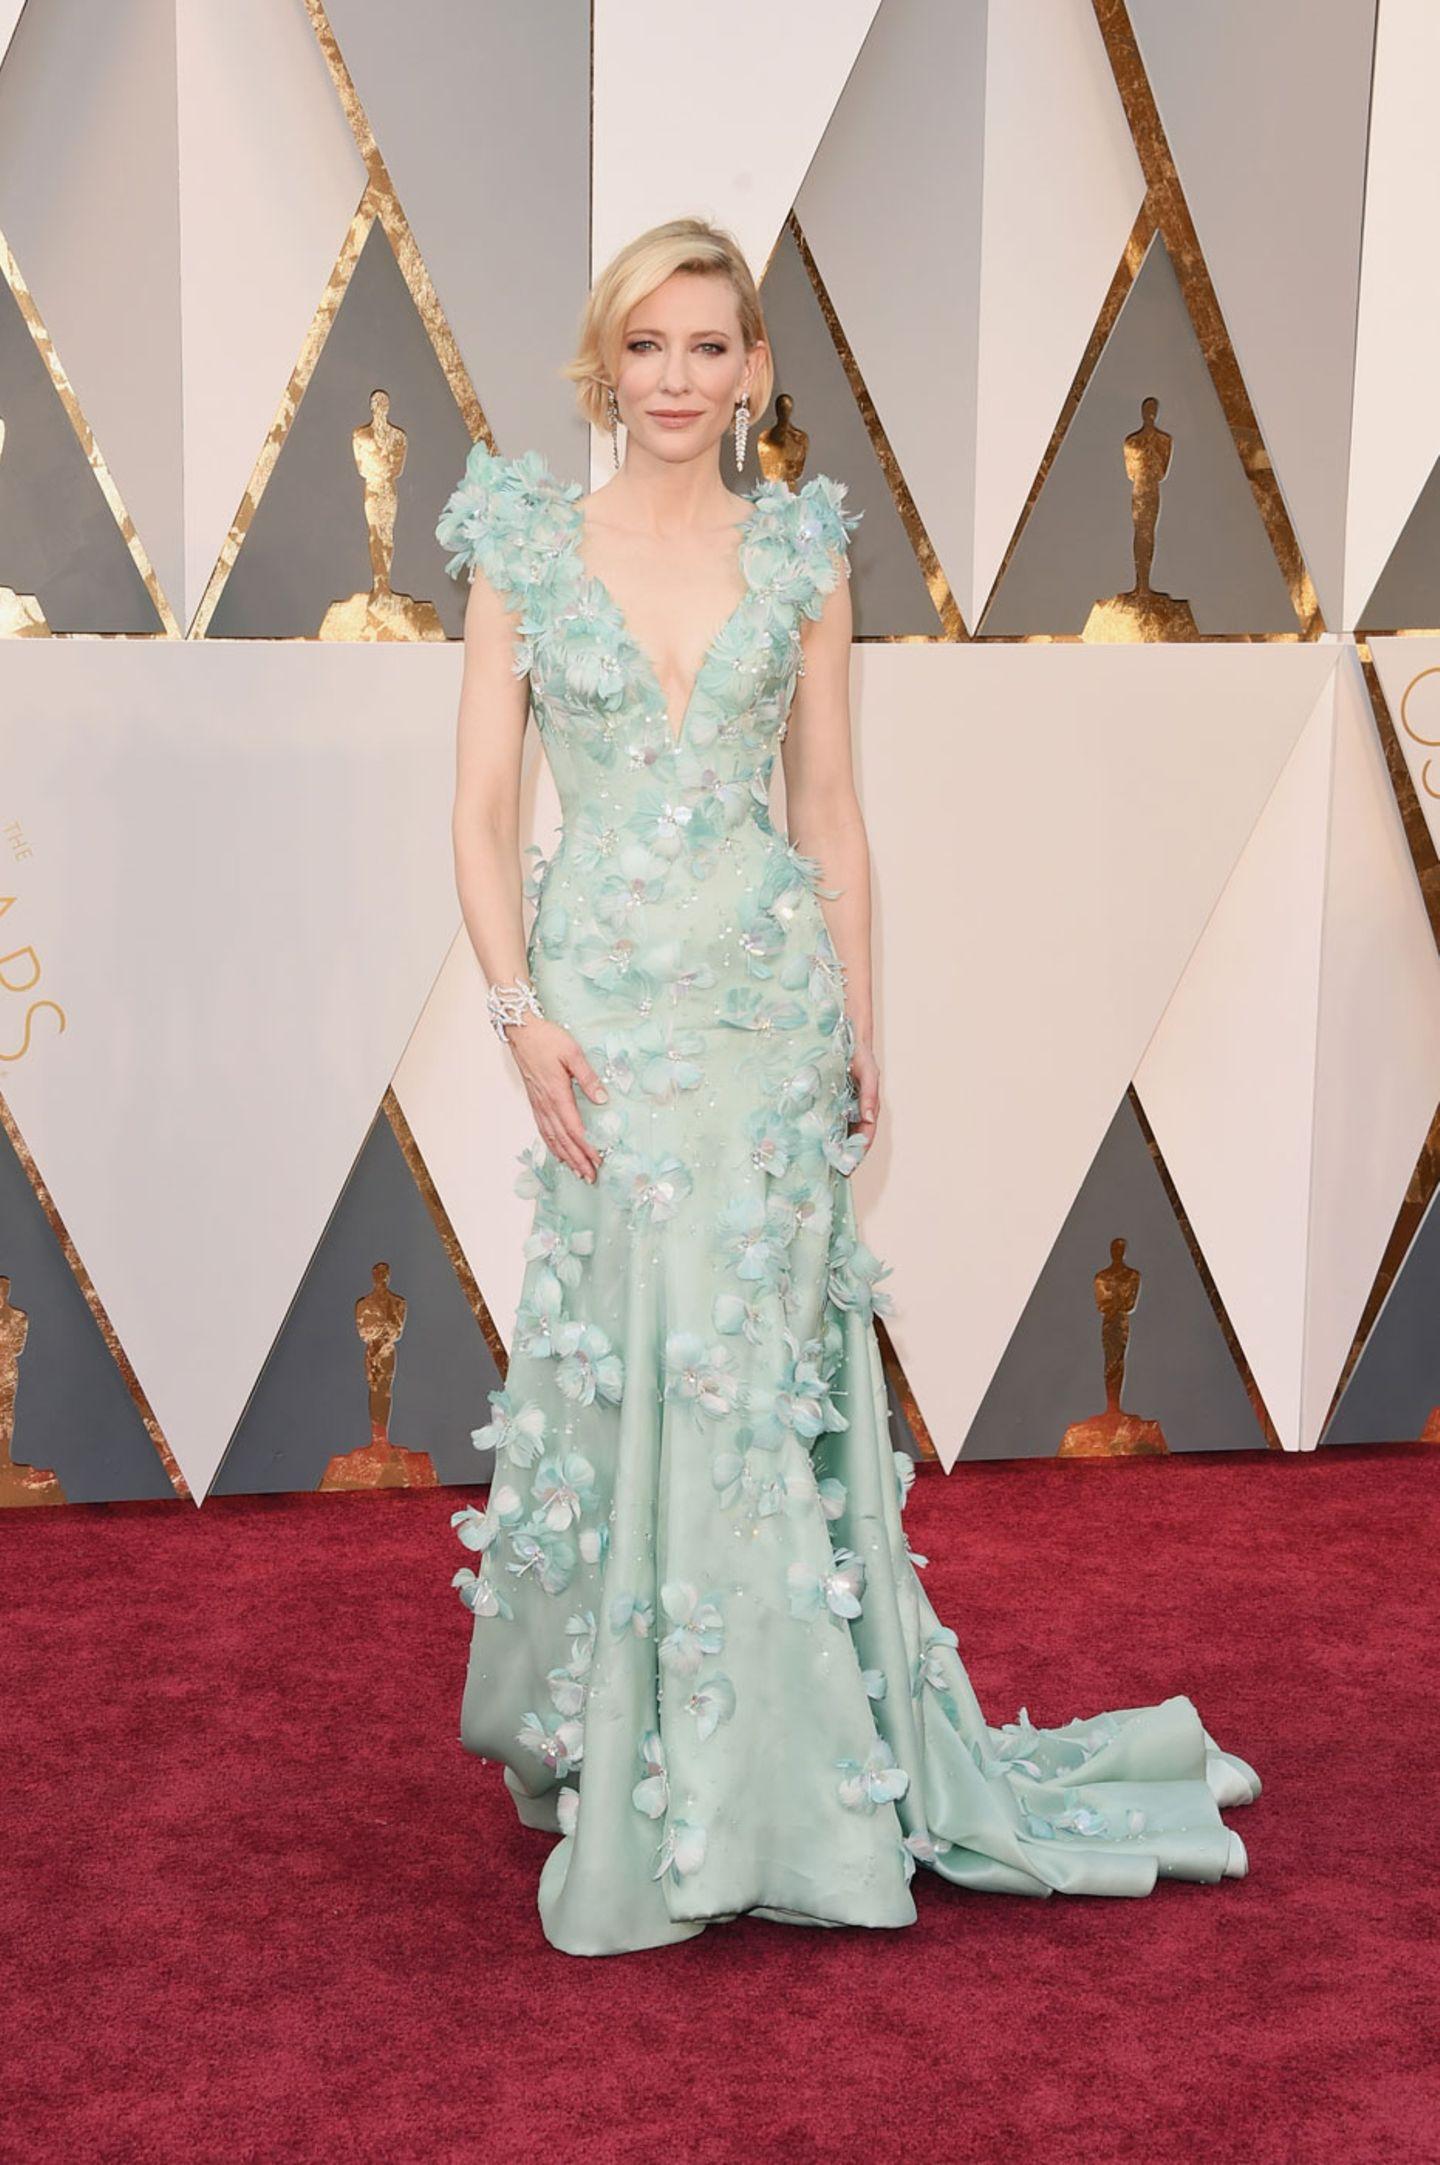 Oscars 2016: Cate Blanchett